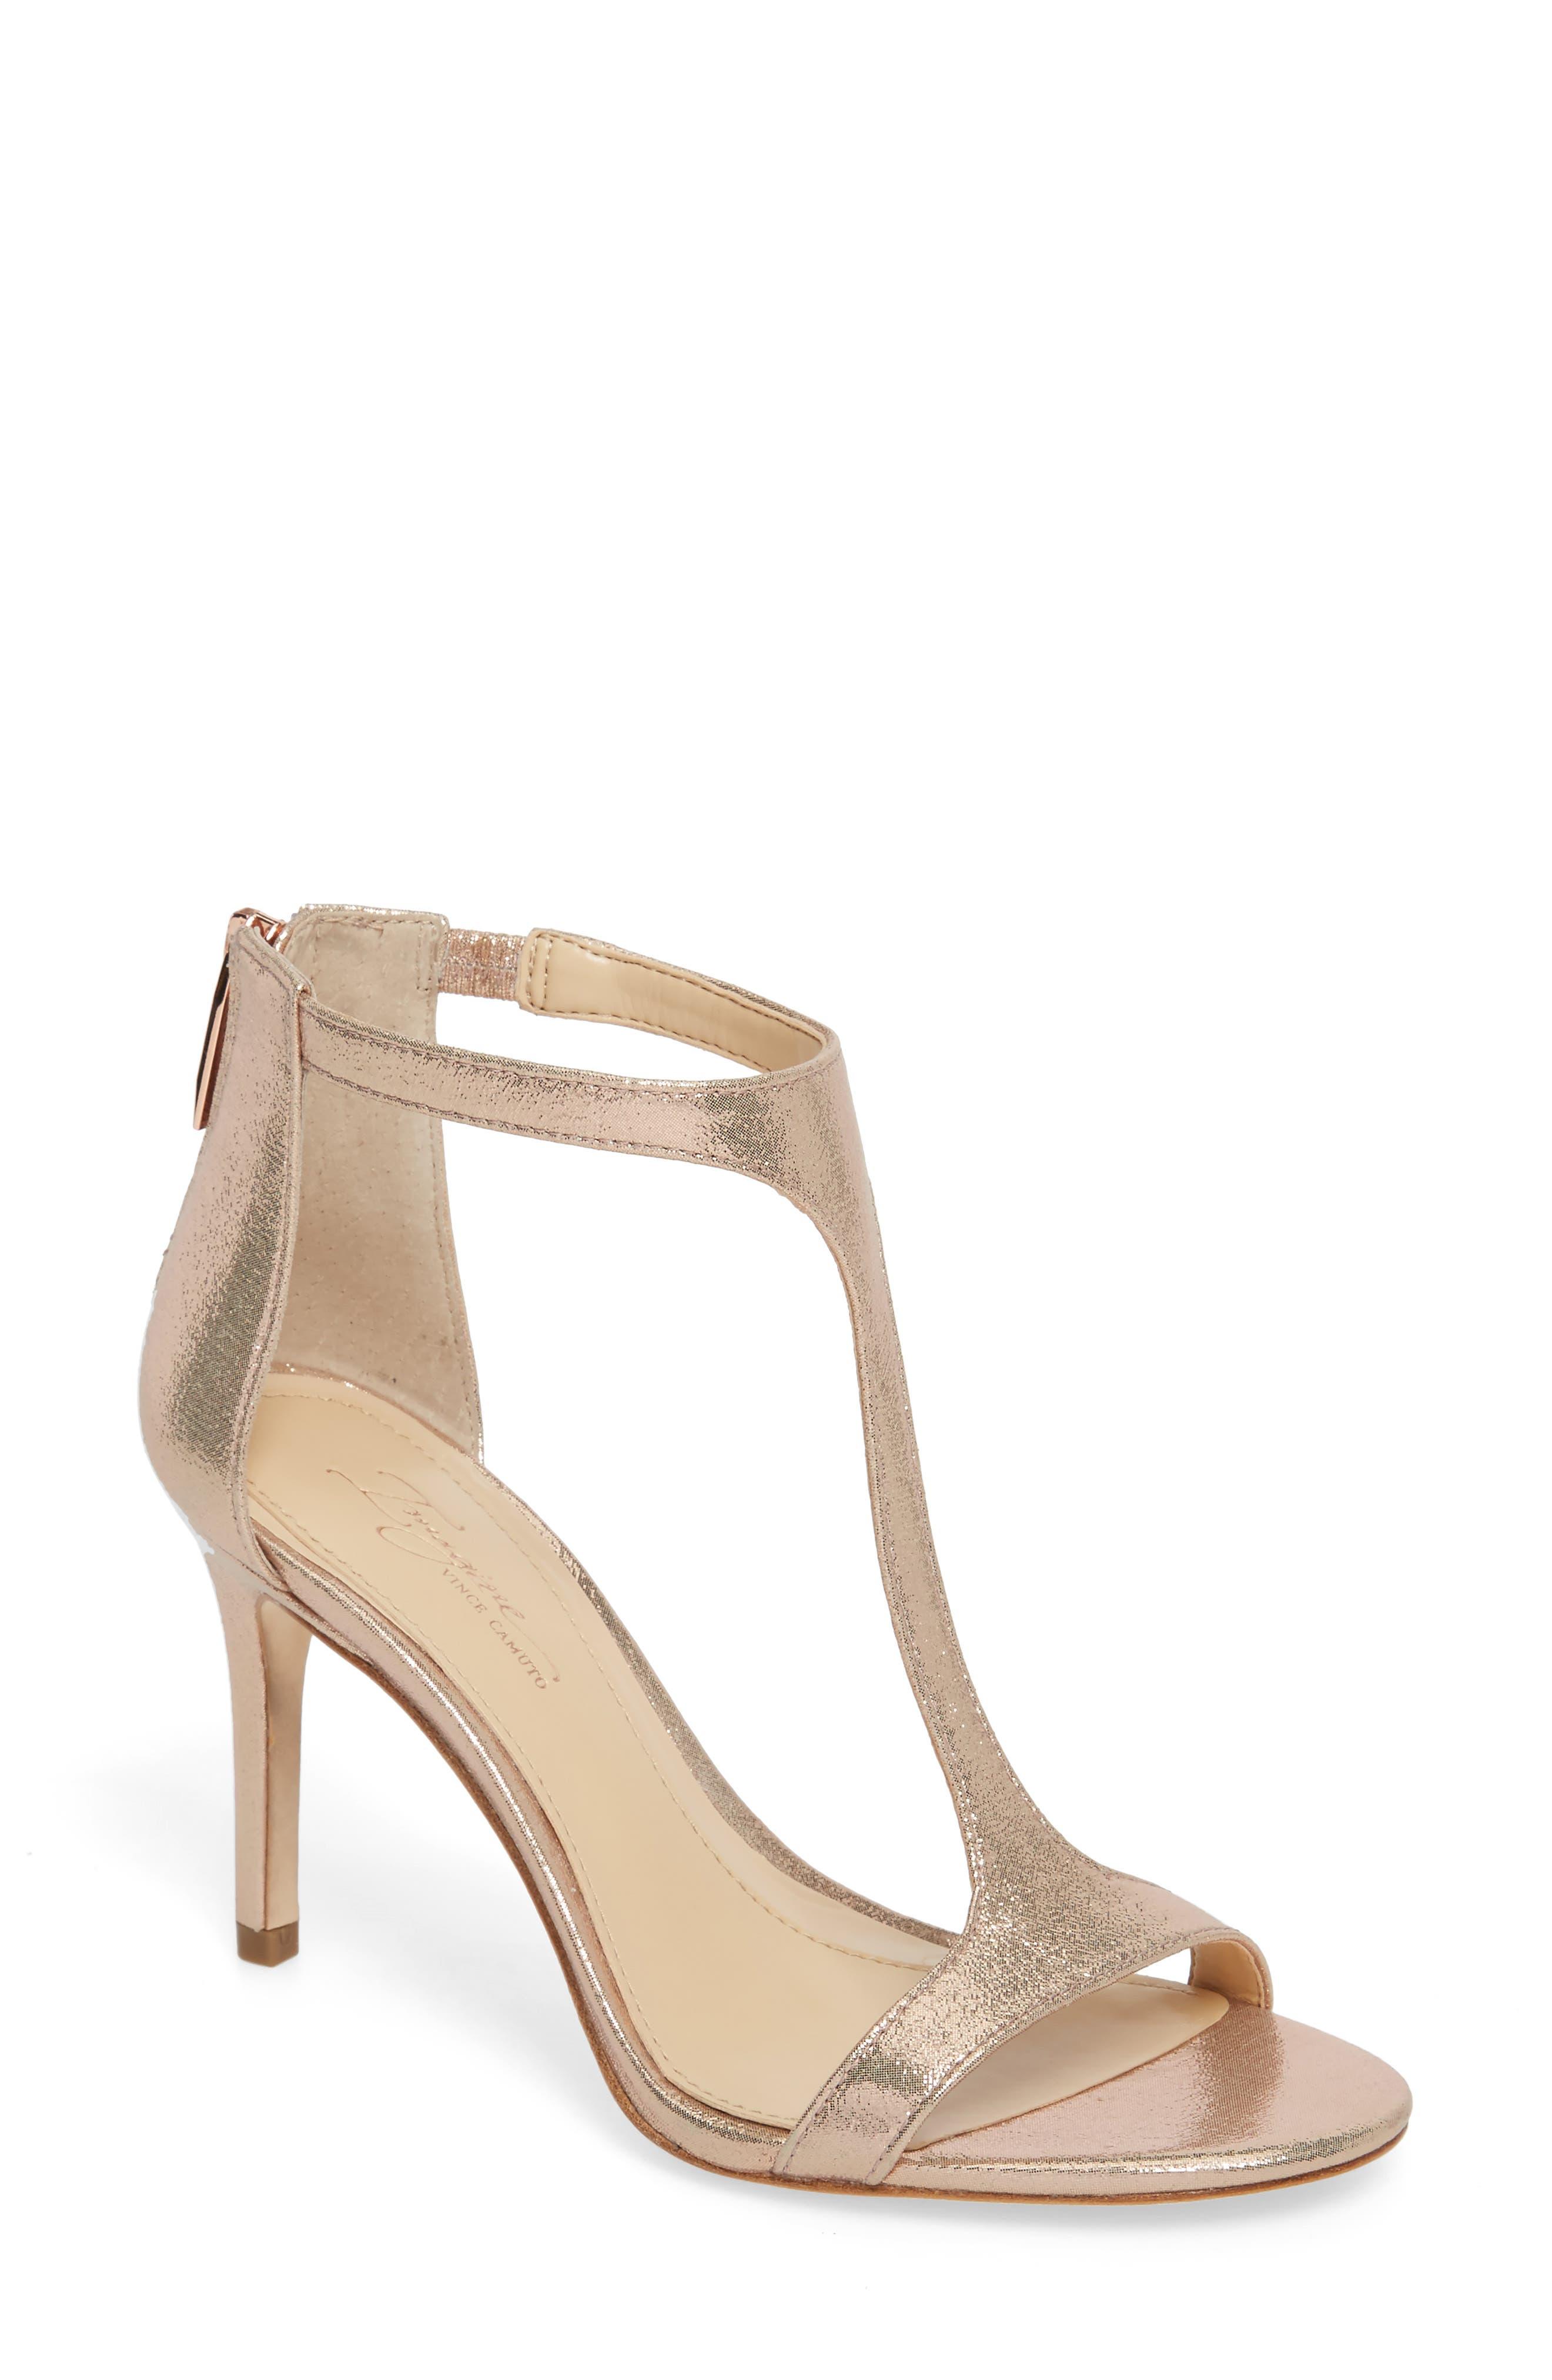 Main Image - Imagine by Vince Camuto 'Phoebe' Embellished T-Strap Sandal (Women)